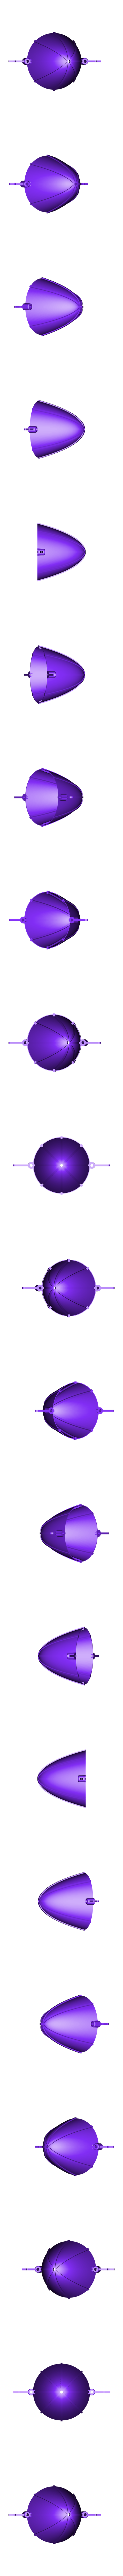 zep04.stl Download free STL file Battle zeppelin lamp • 3D print design, vd_max